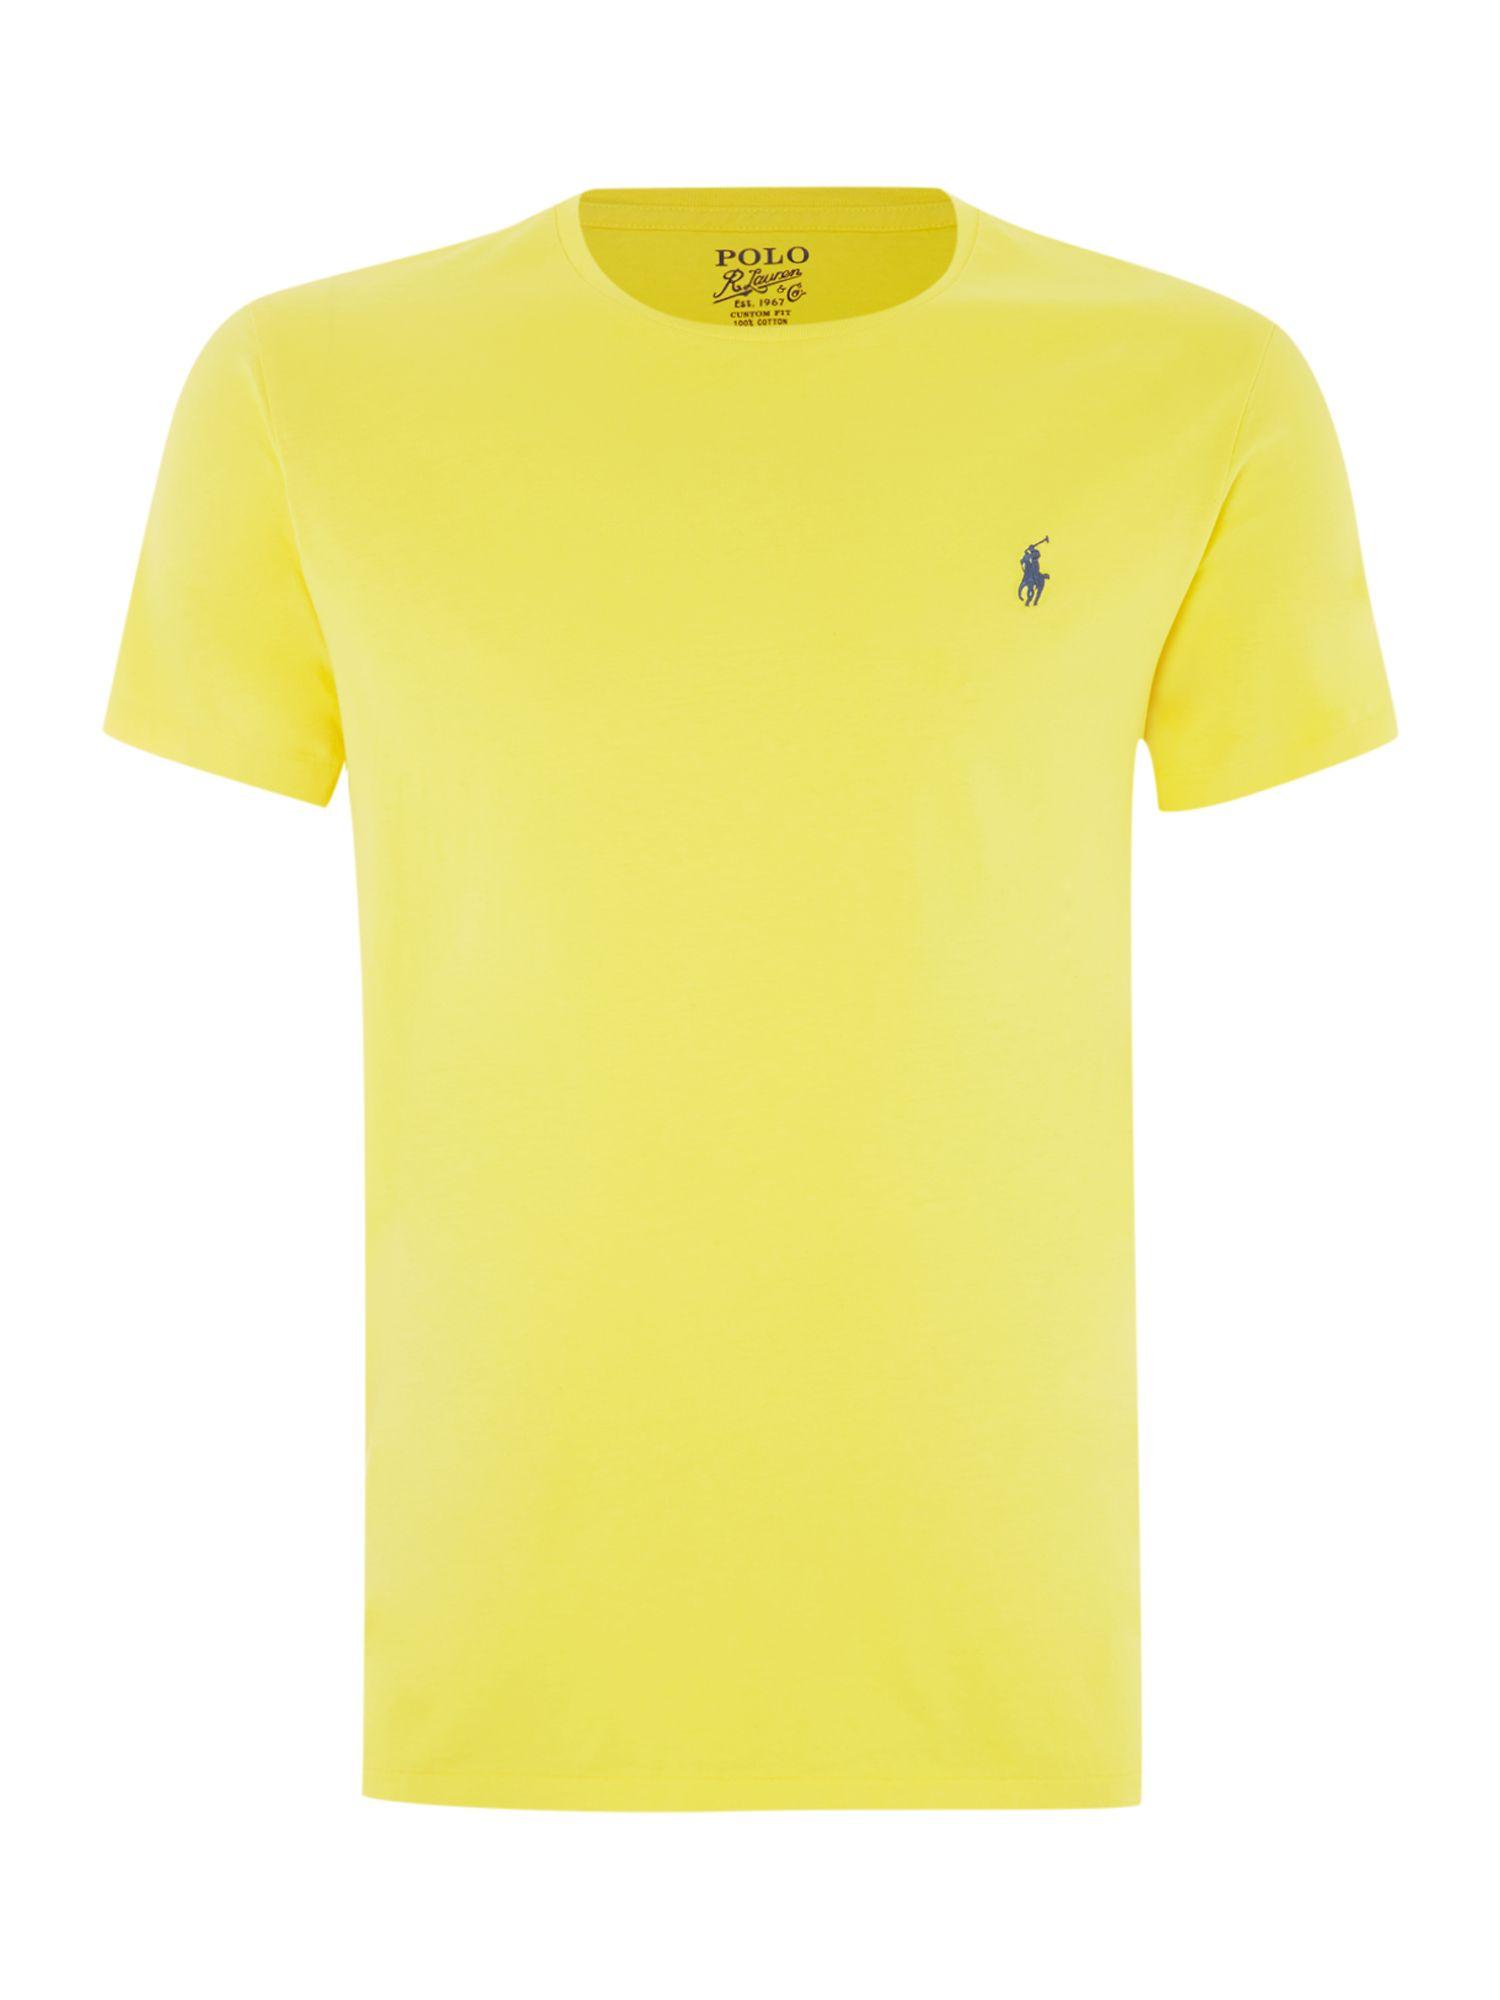 Lyst polo ralph lauren classic custom fit t shirt in for Polo custom fit t shirts